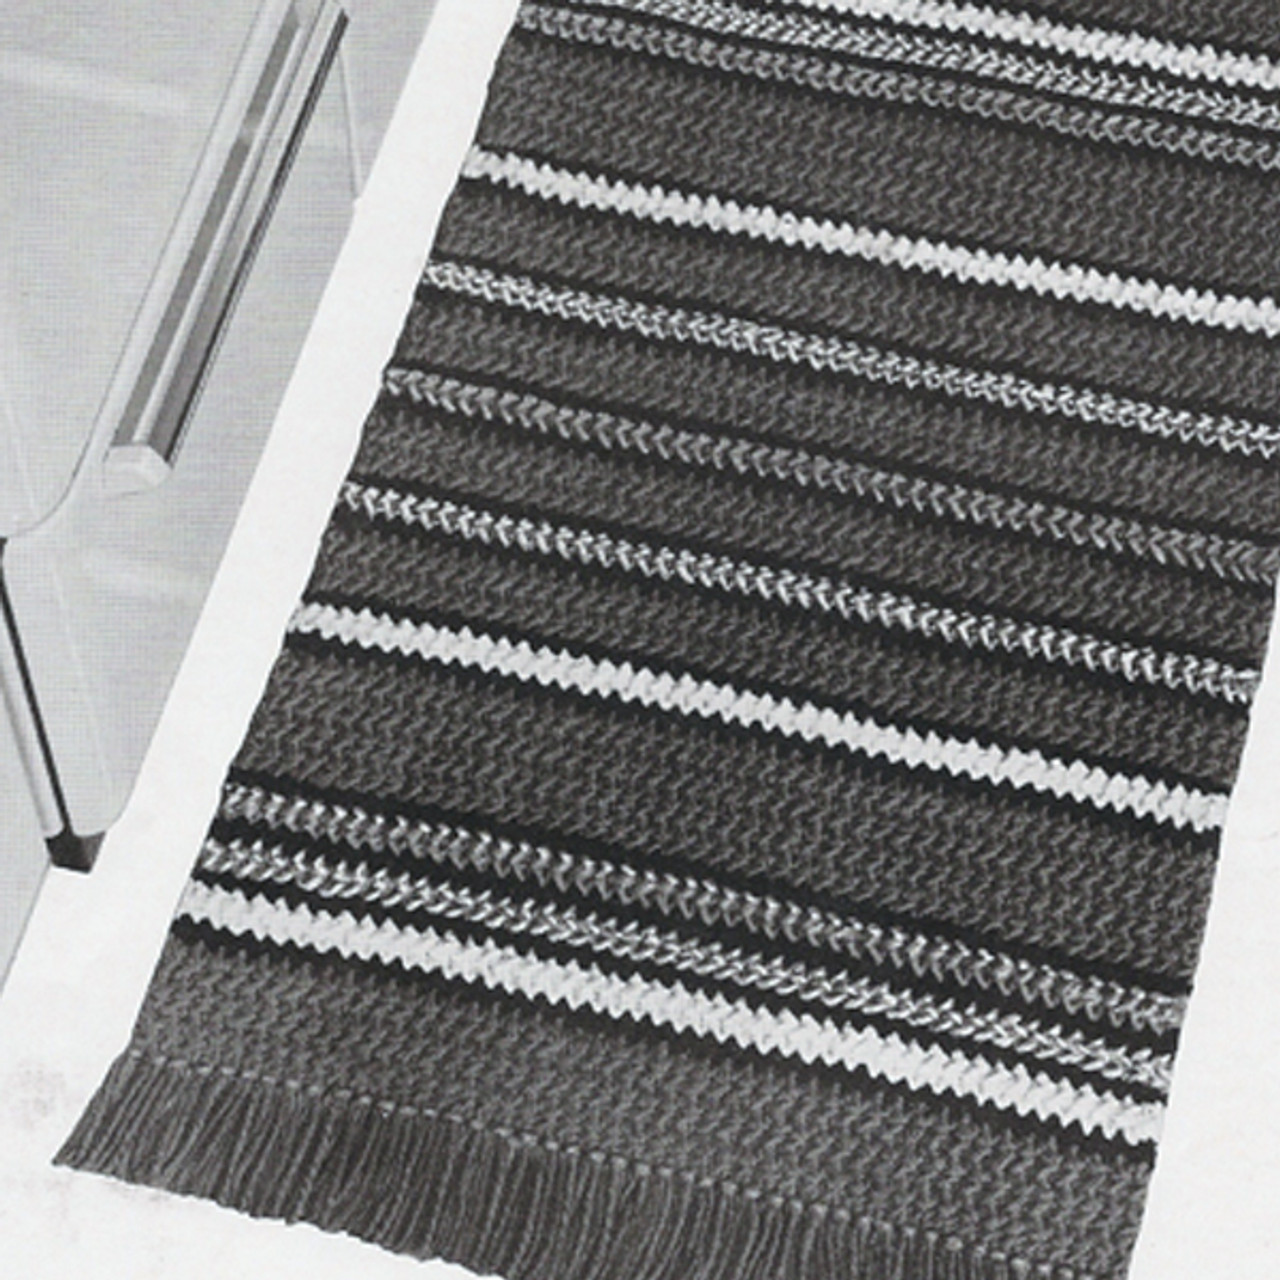 Striped Rug Crochet Pattern from American Thread